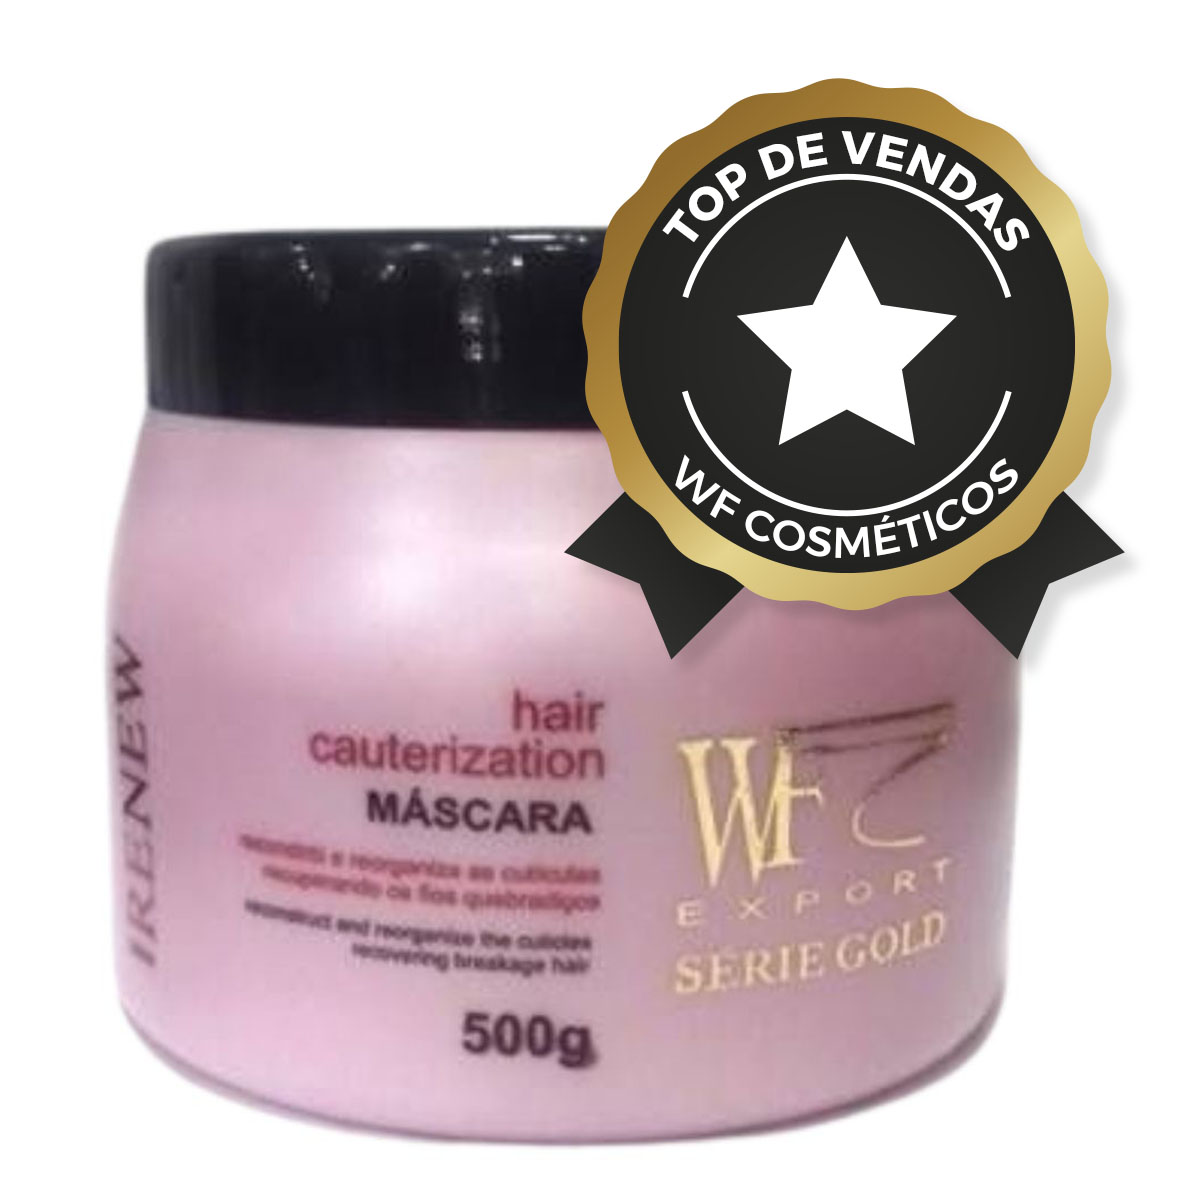 RENEW - MASCARA HAIR CAUTERIZATION WF COSMETICOS 500G